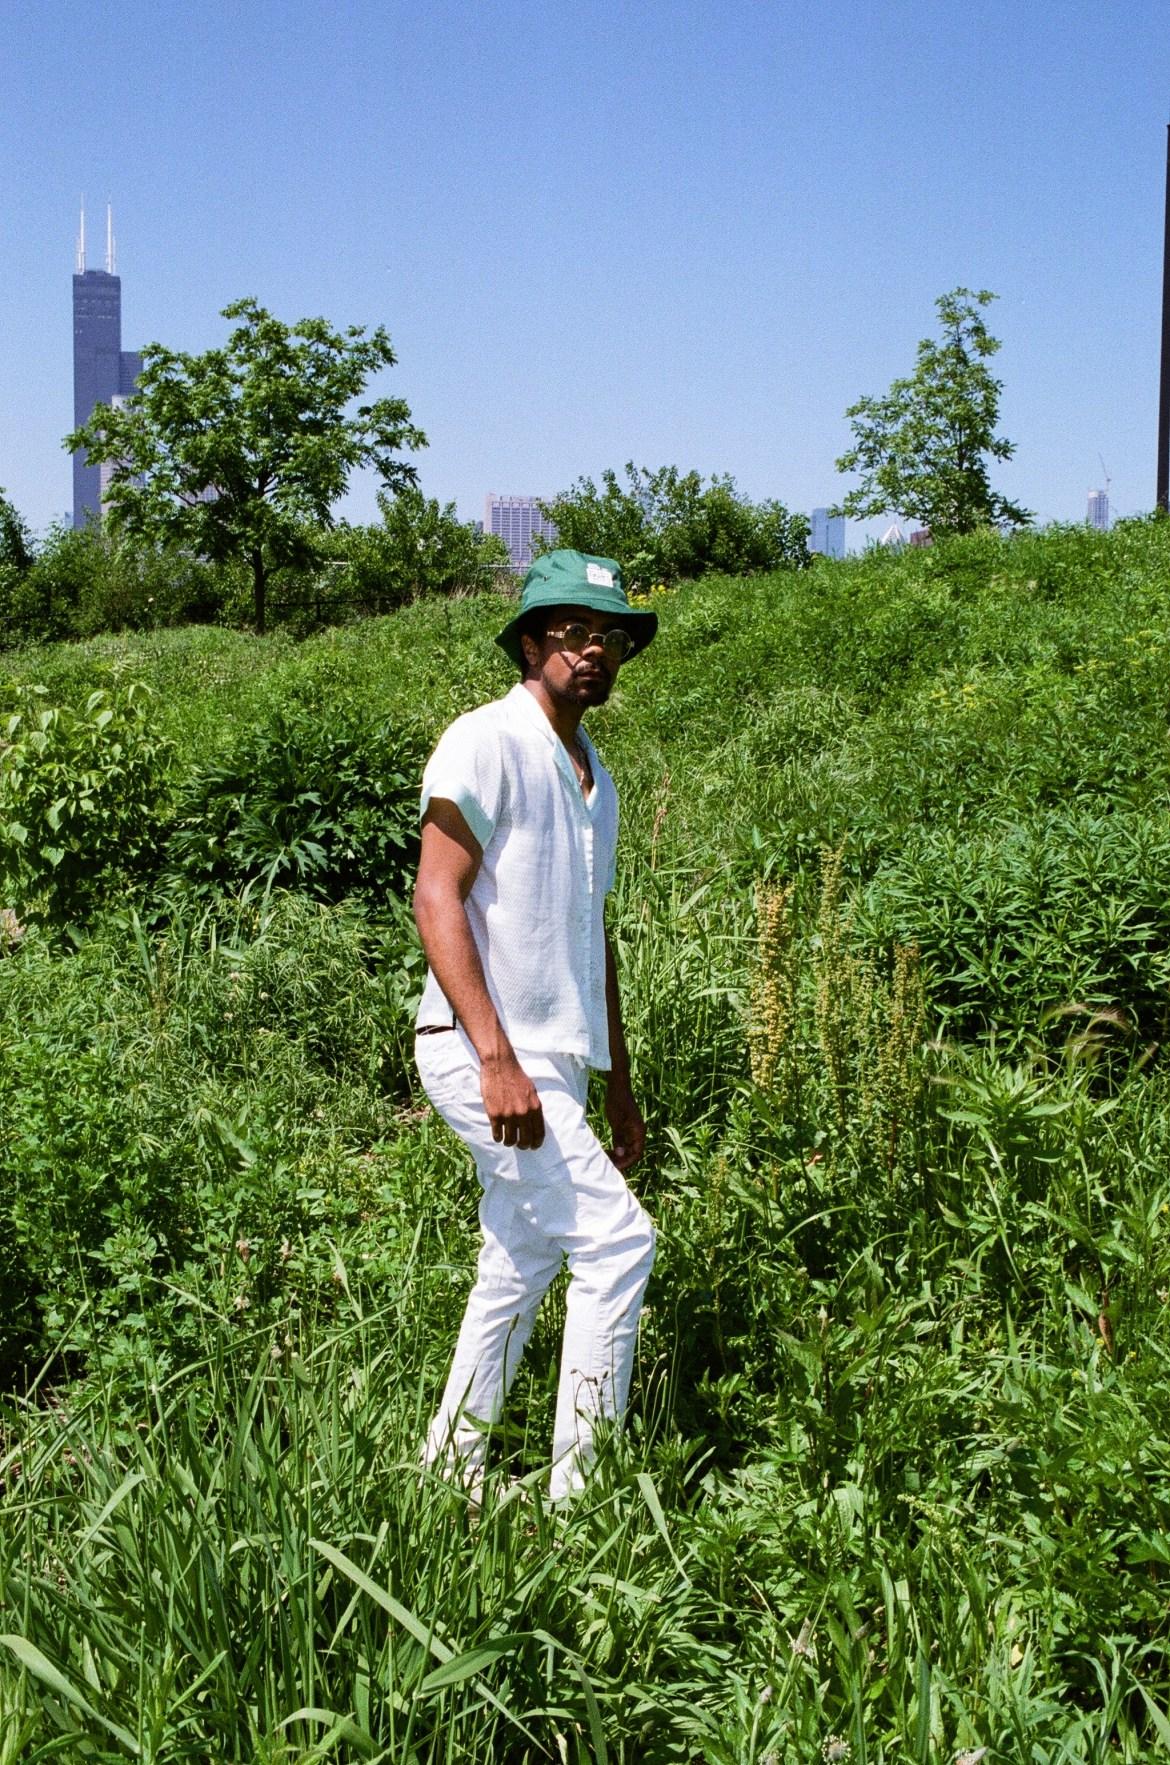 Nate in Grass